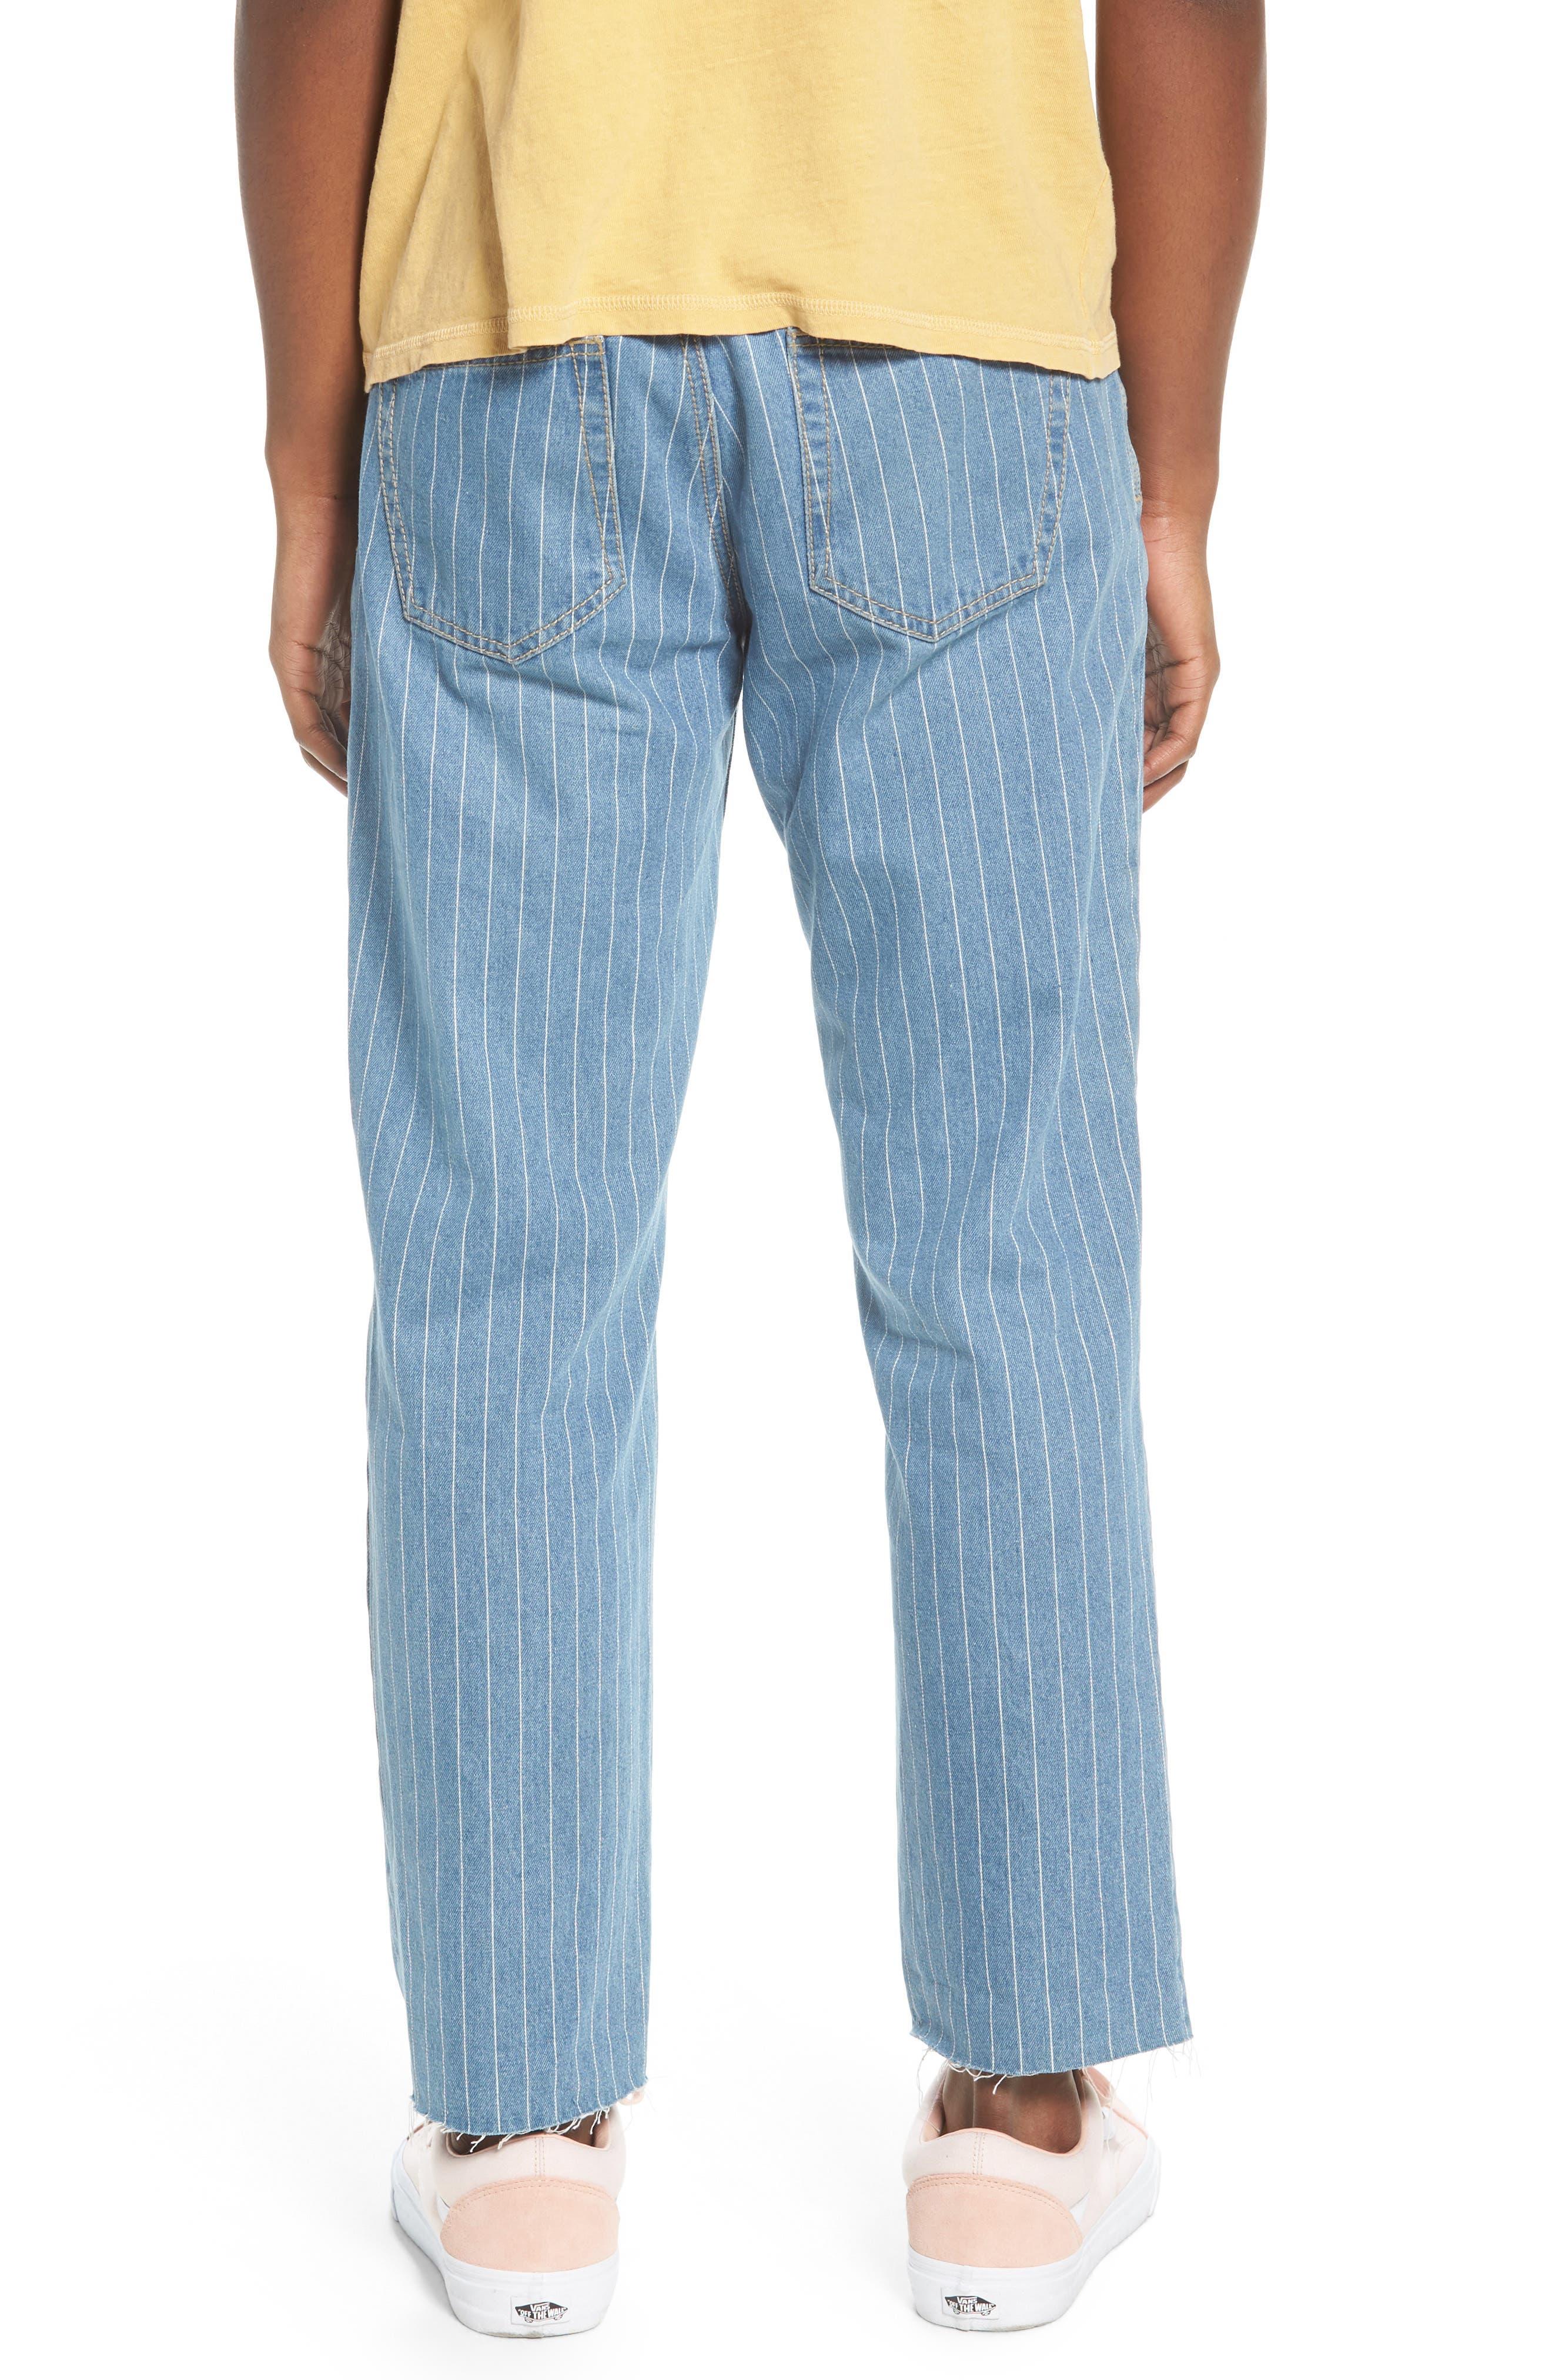 B. Relaxed Jeans,                             Alternate thumbnail 2, color,                             Stripe Denim Crop